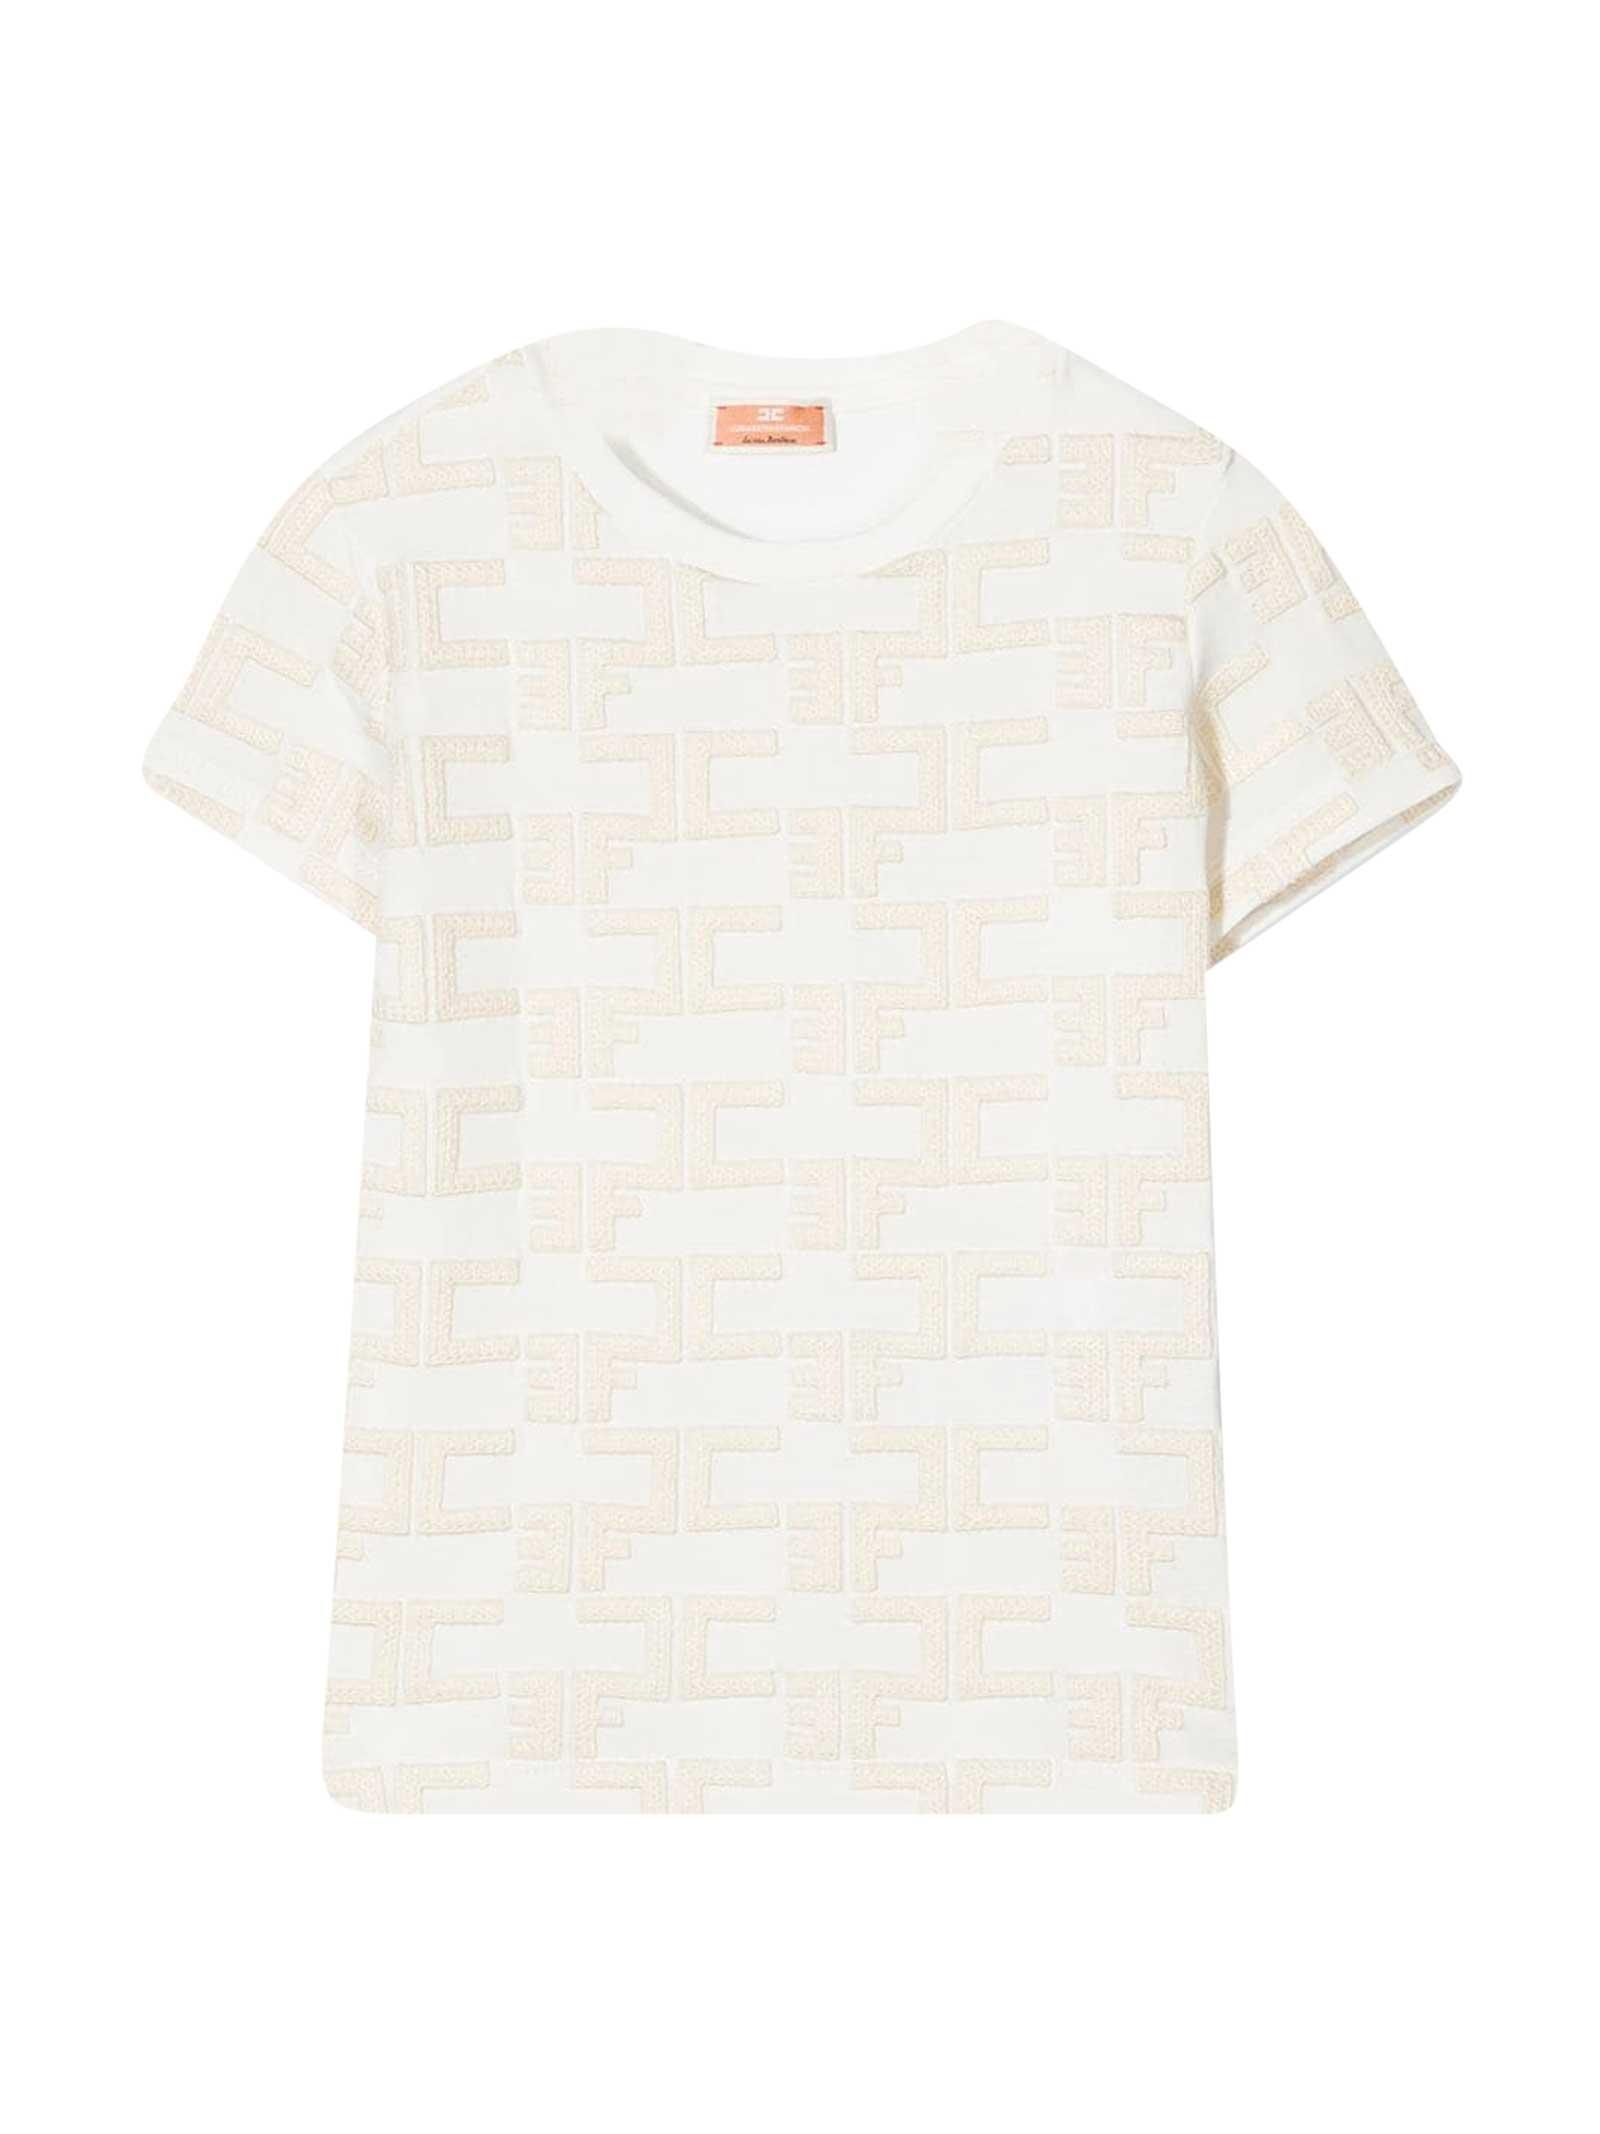 Elisabetta Franchi La Mia Bambina Cottons WHITE T-SHIRT